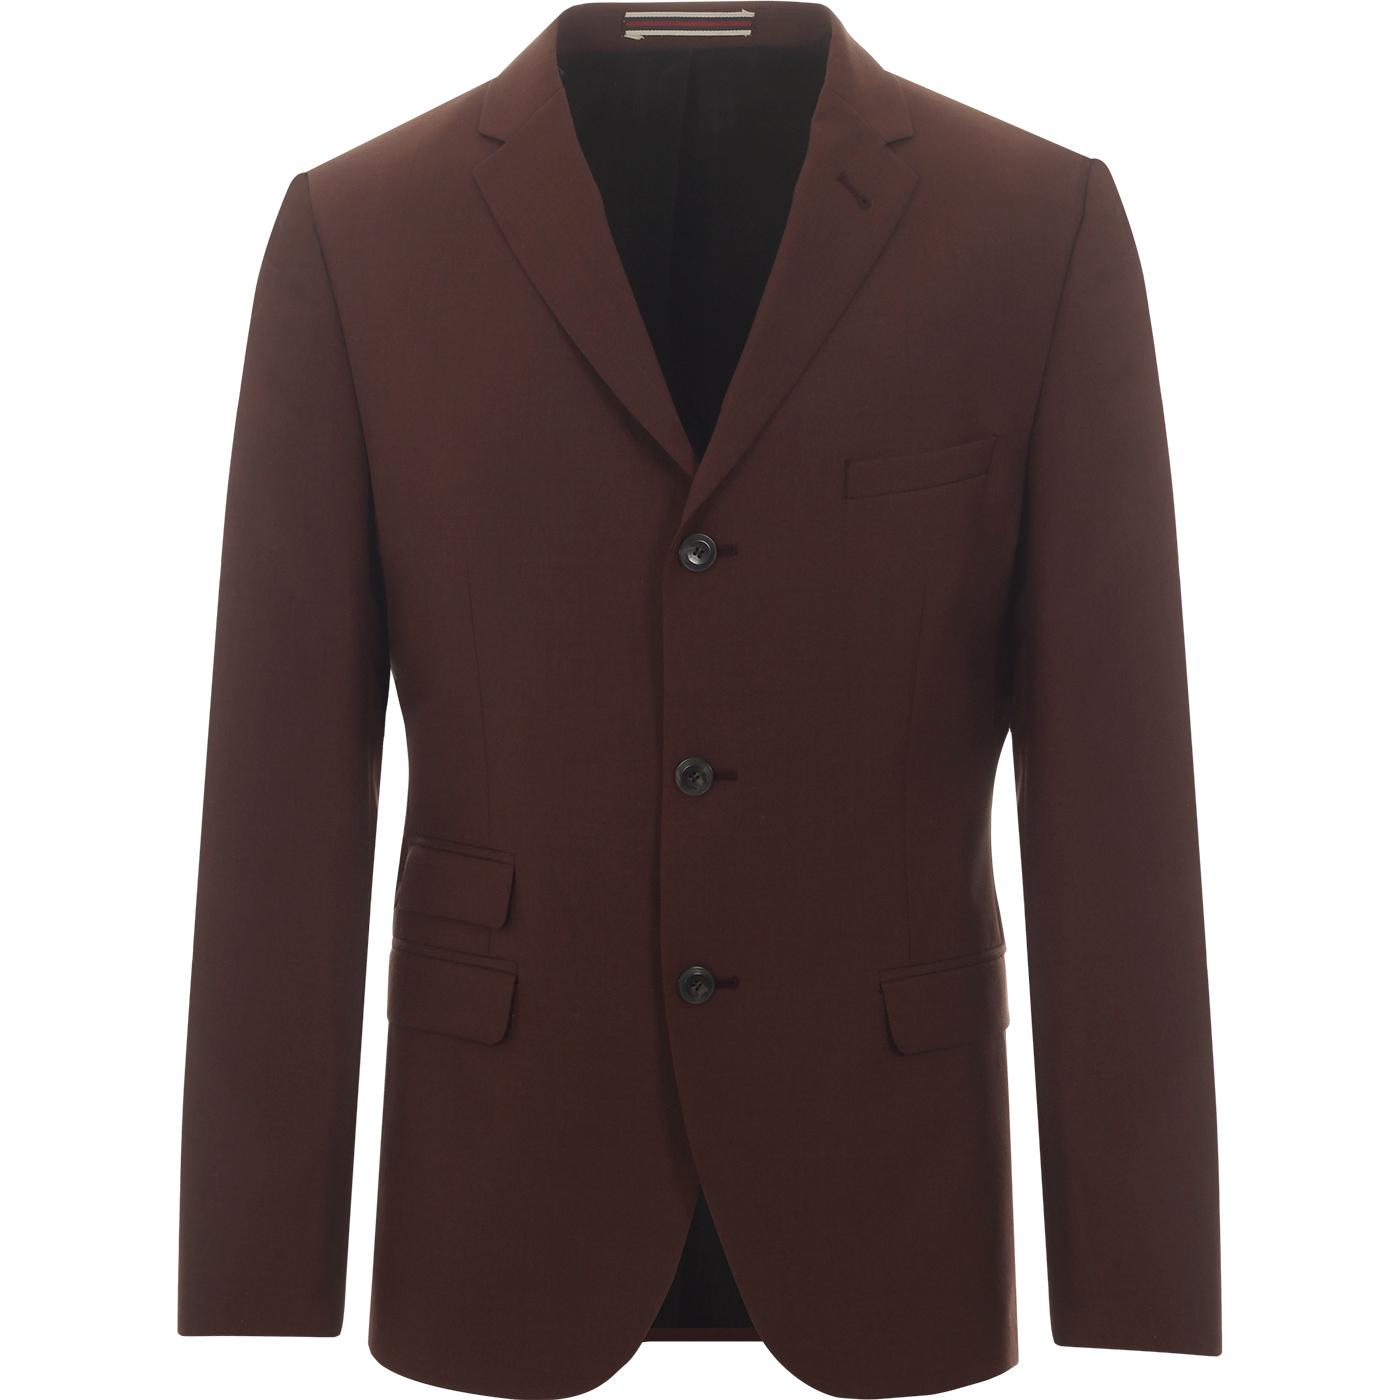 BEN SHERMAN 3 Button Tonic Suit Jacket (TOBACCO)